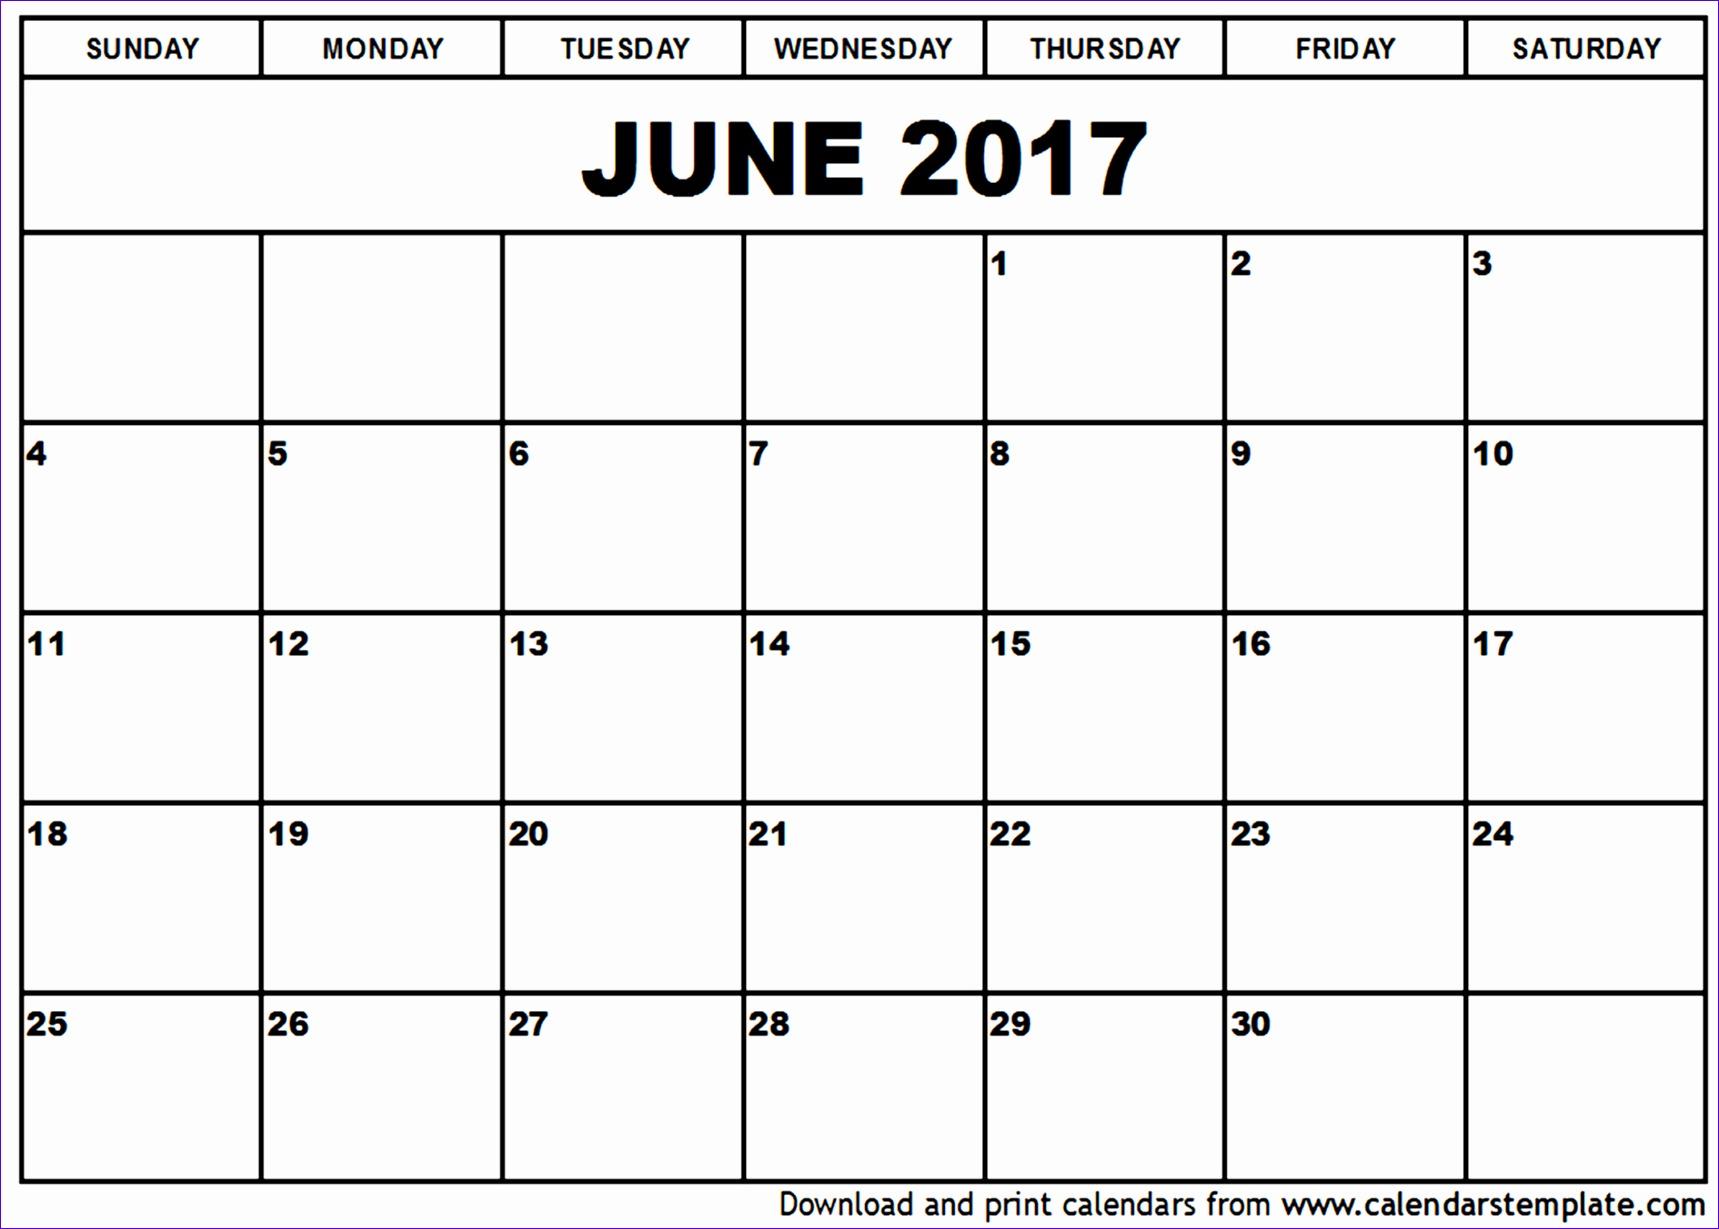 june 2017 calendar 3301 17191229